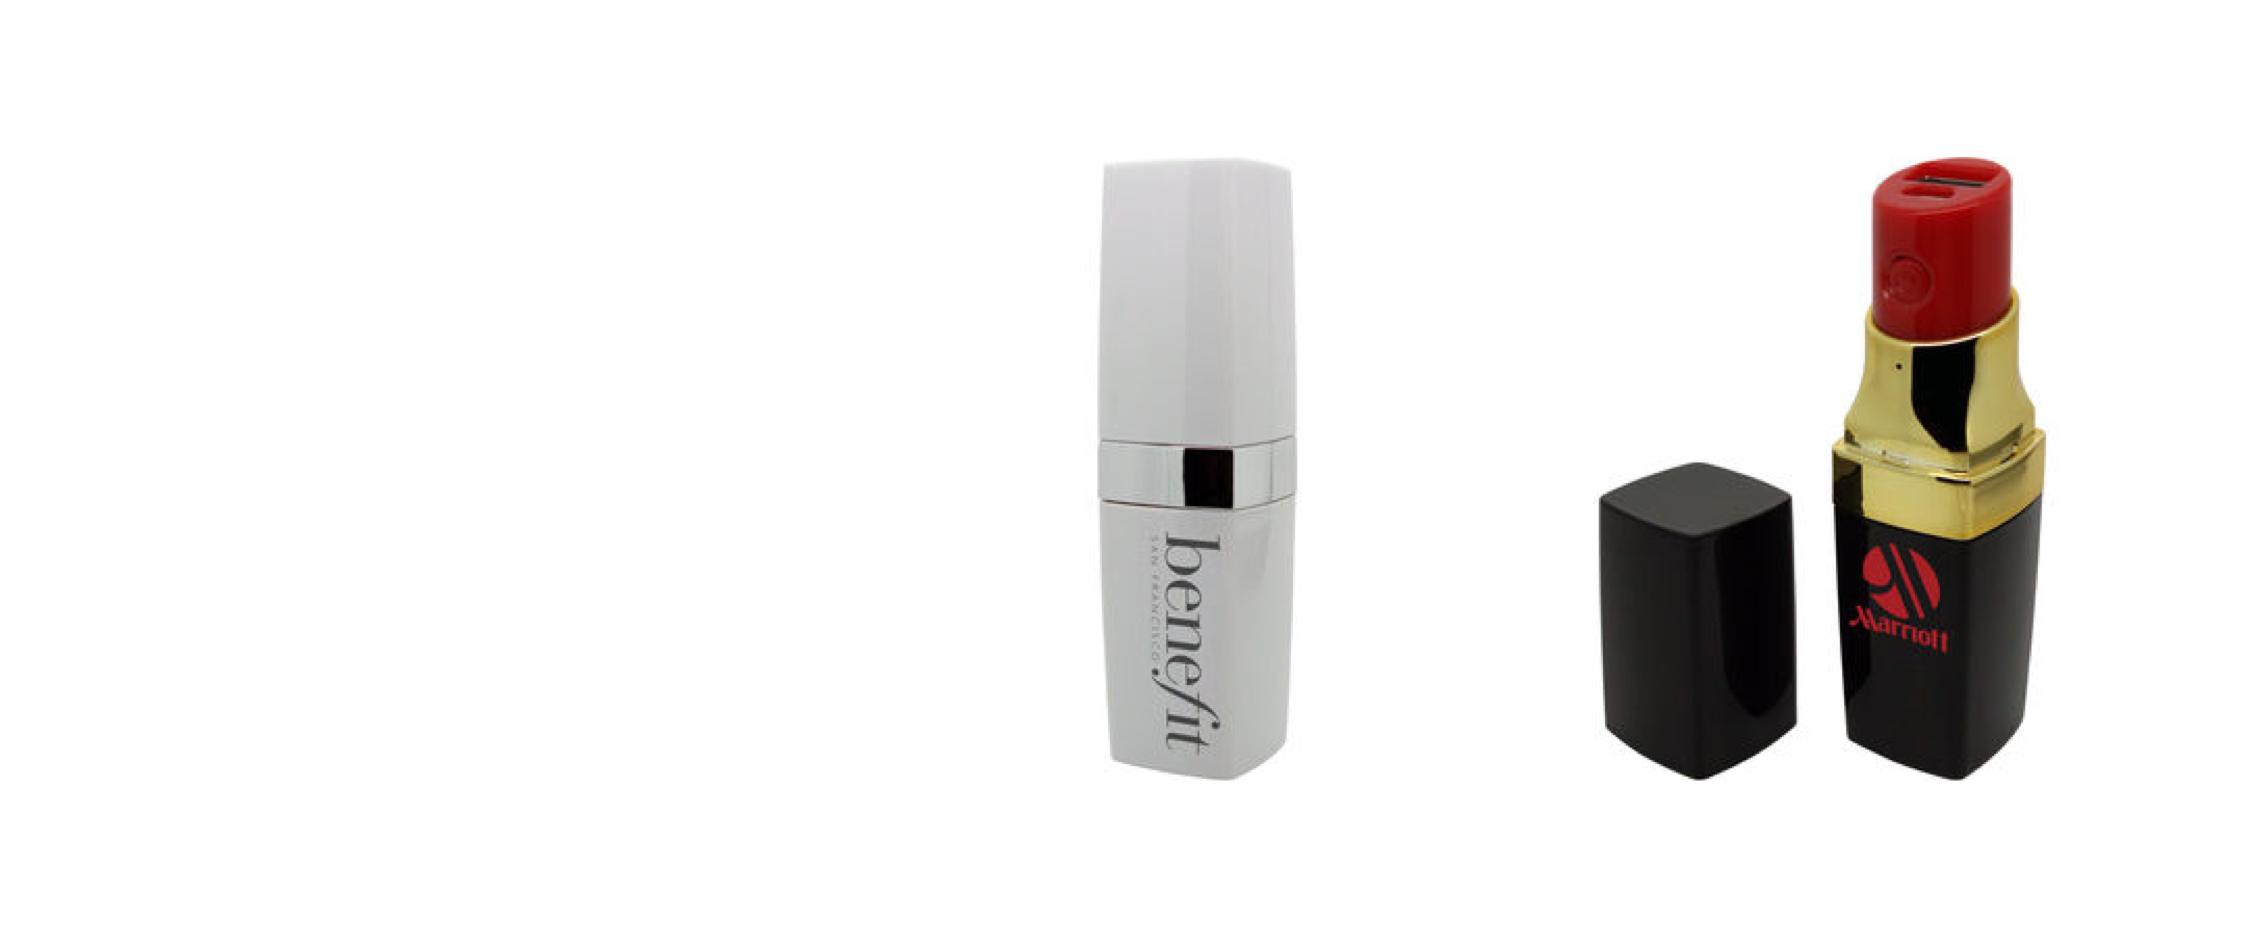 Branded Lipstick Powercharger, Powerbank, Powerstick, Juice Bank.